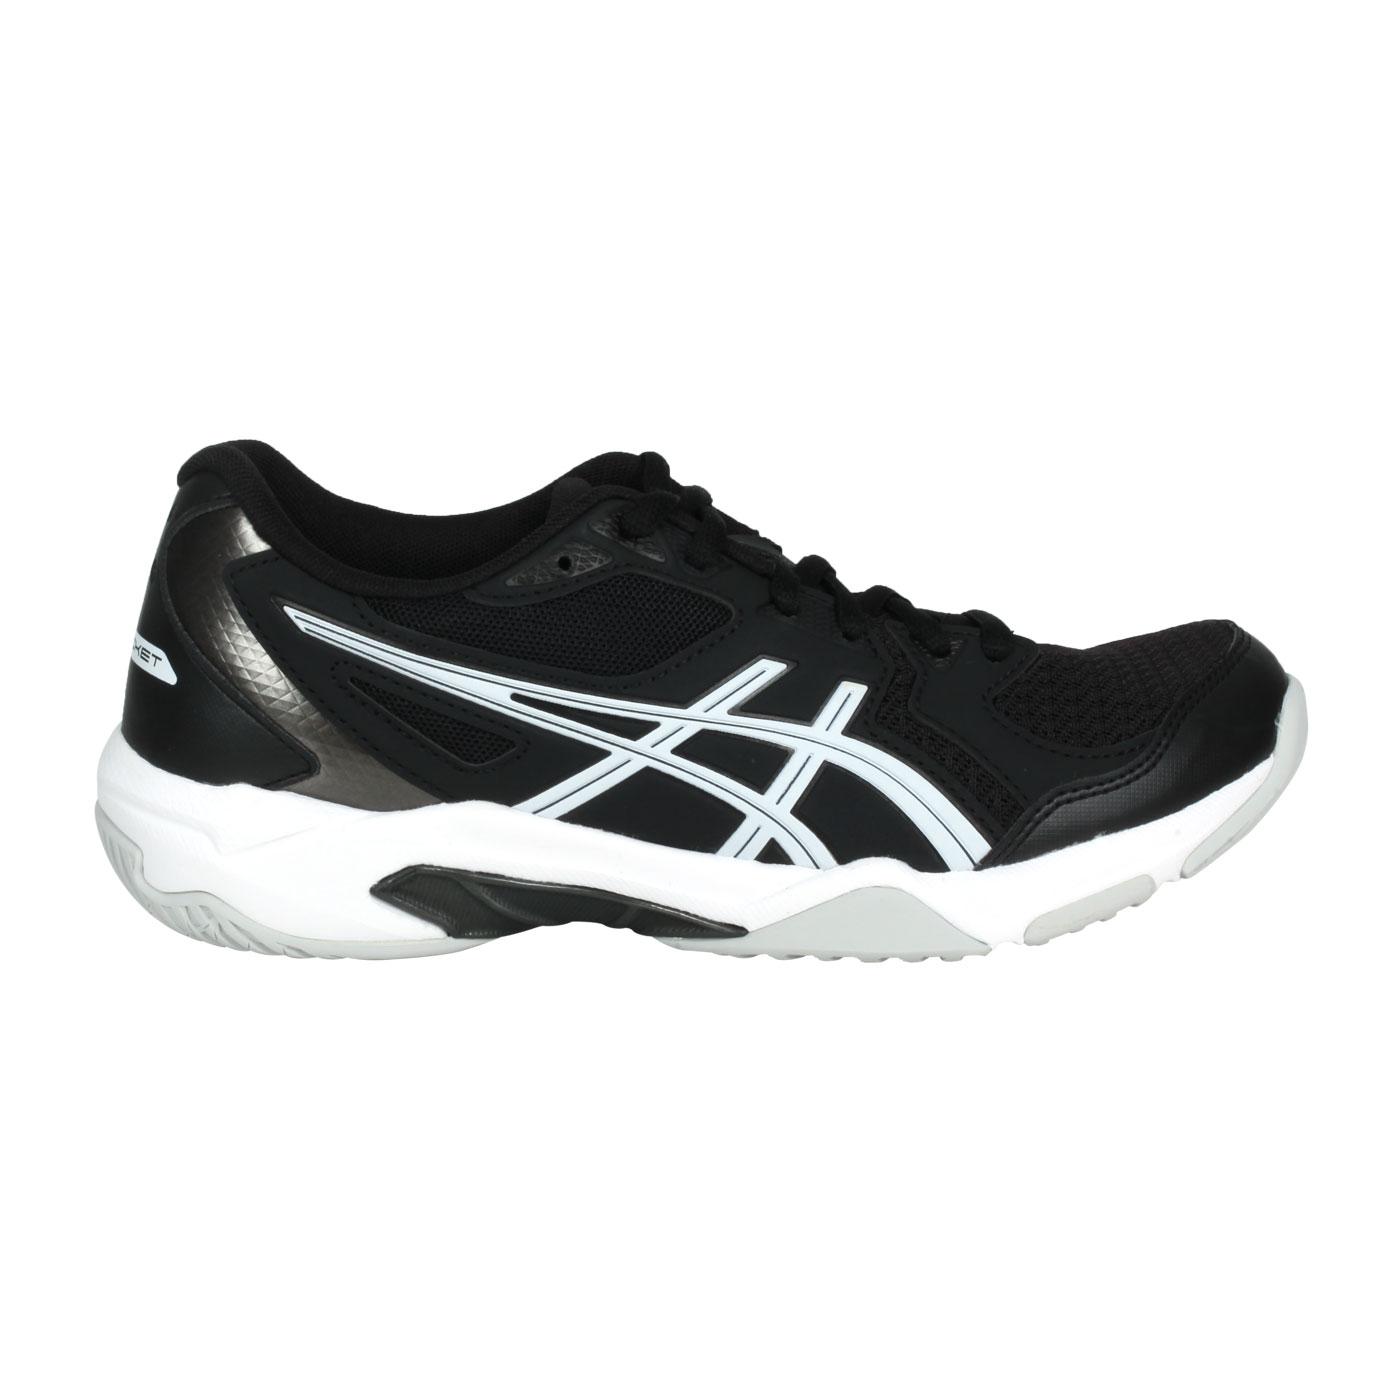 ASICS 女款排羽球鞋  @GEL-ROCKET 10@1072A056-001 - 黑白